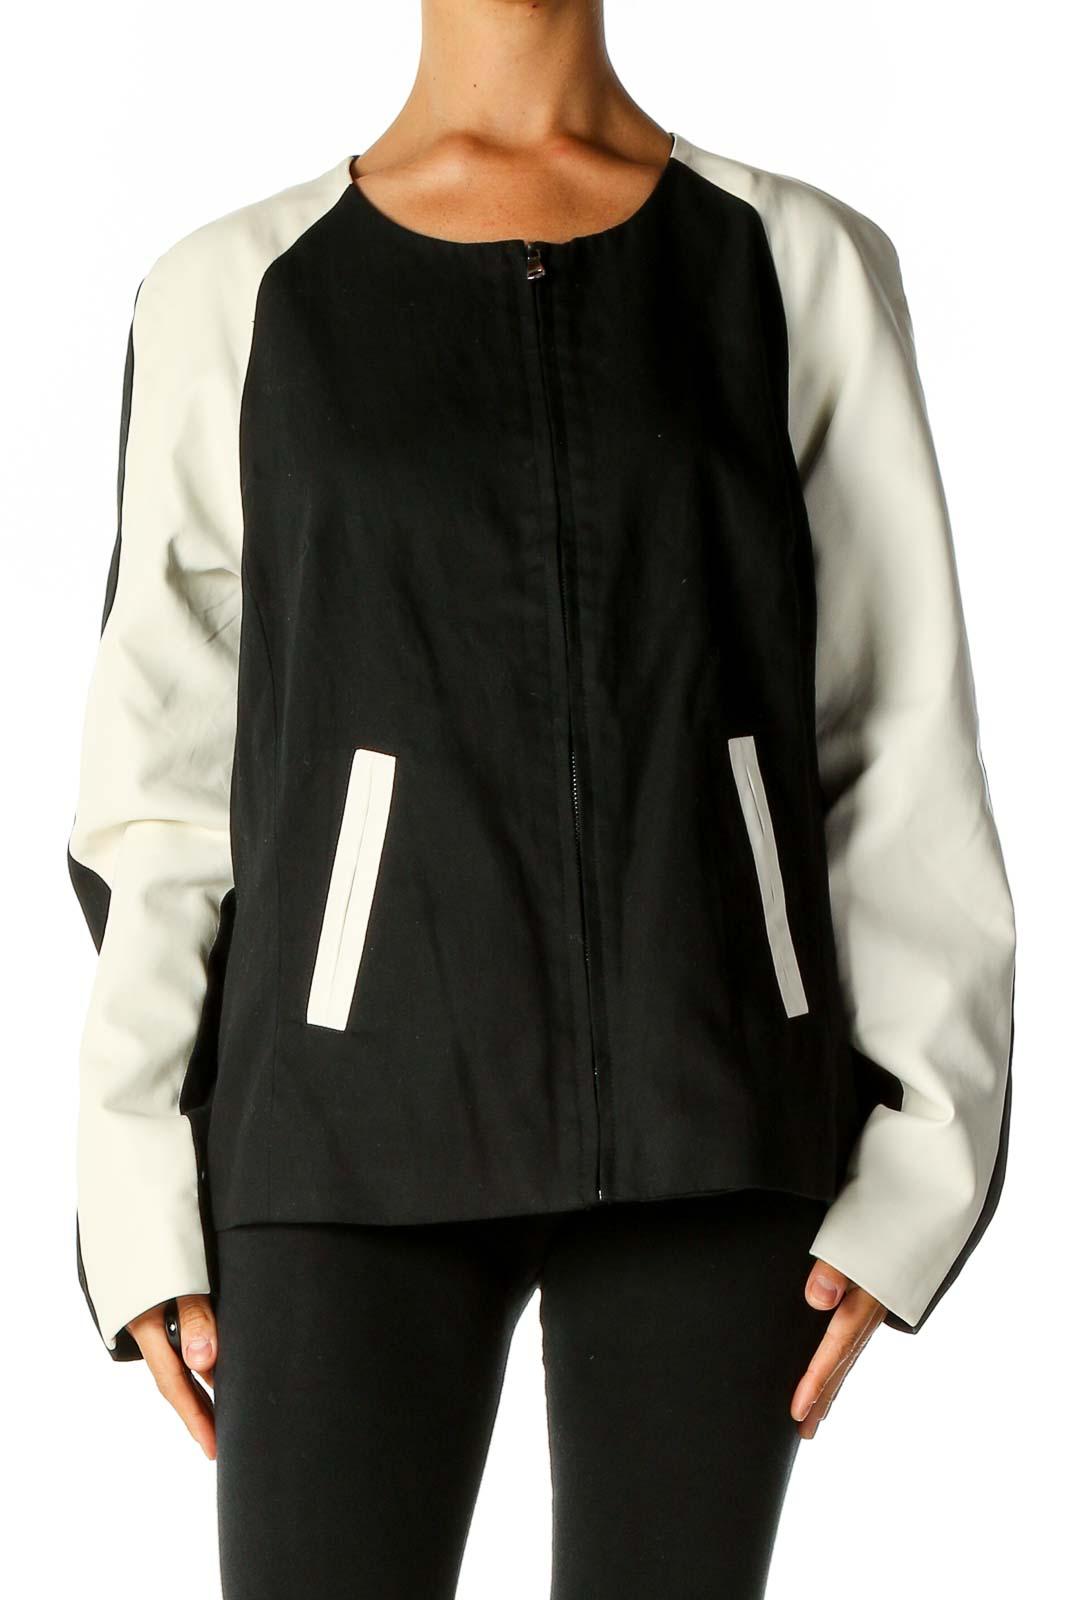 Black Colorblock Jacket Front